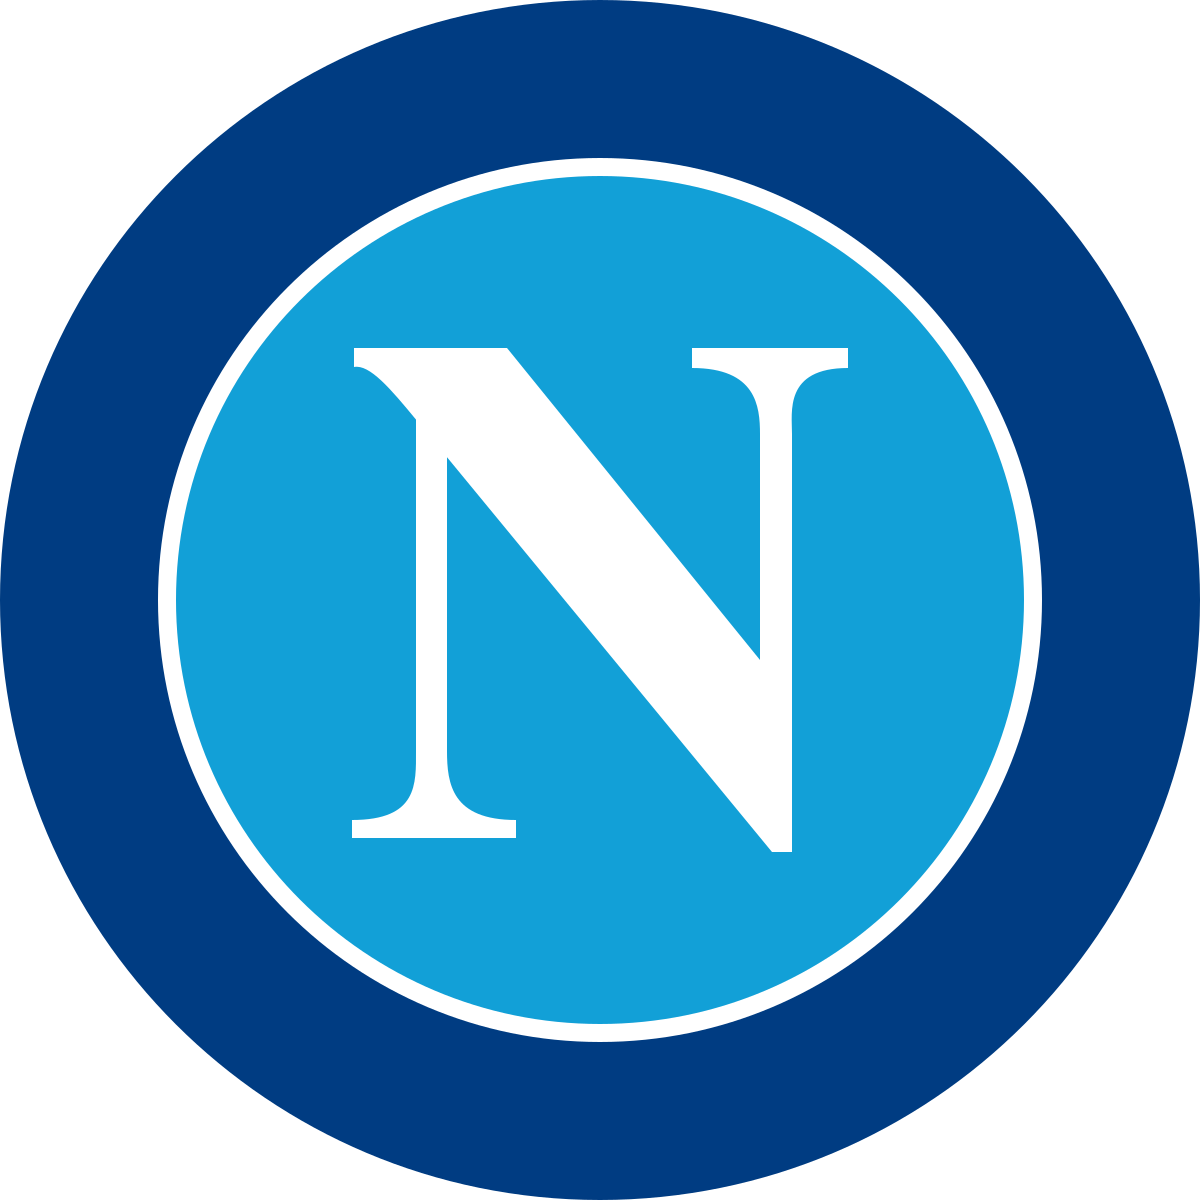 1200px-s_s_c_napoli_logo_svg.png